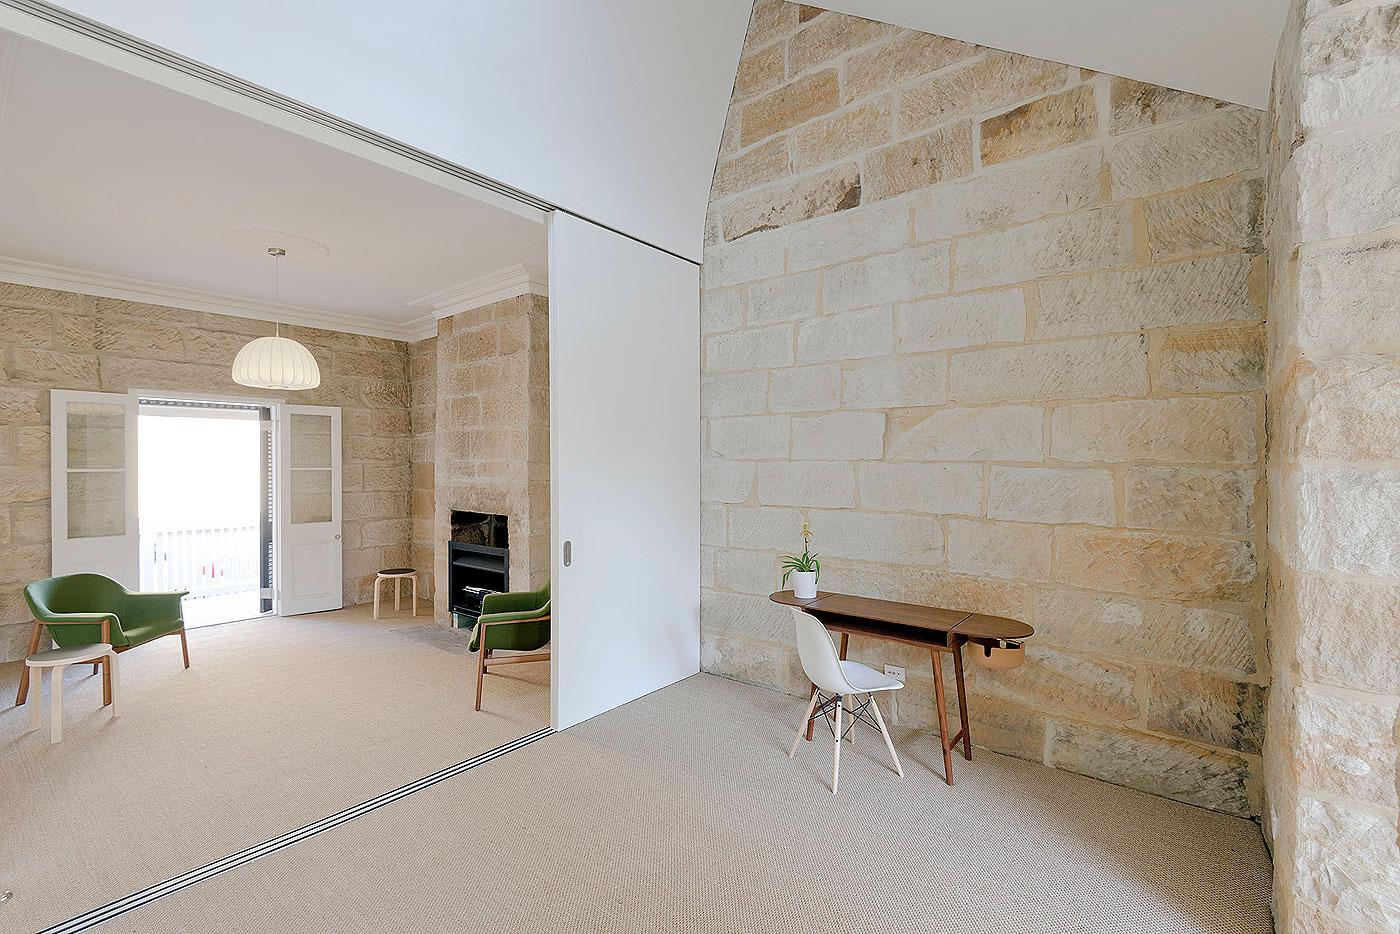 interni casa pietra arenaria rivestimenti balmain sidney studio carter williamson